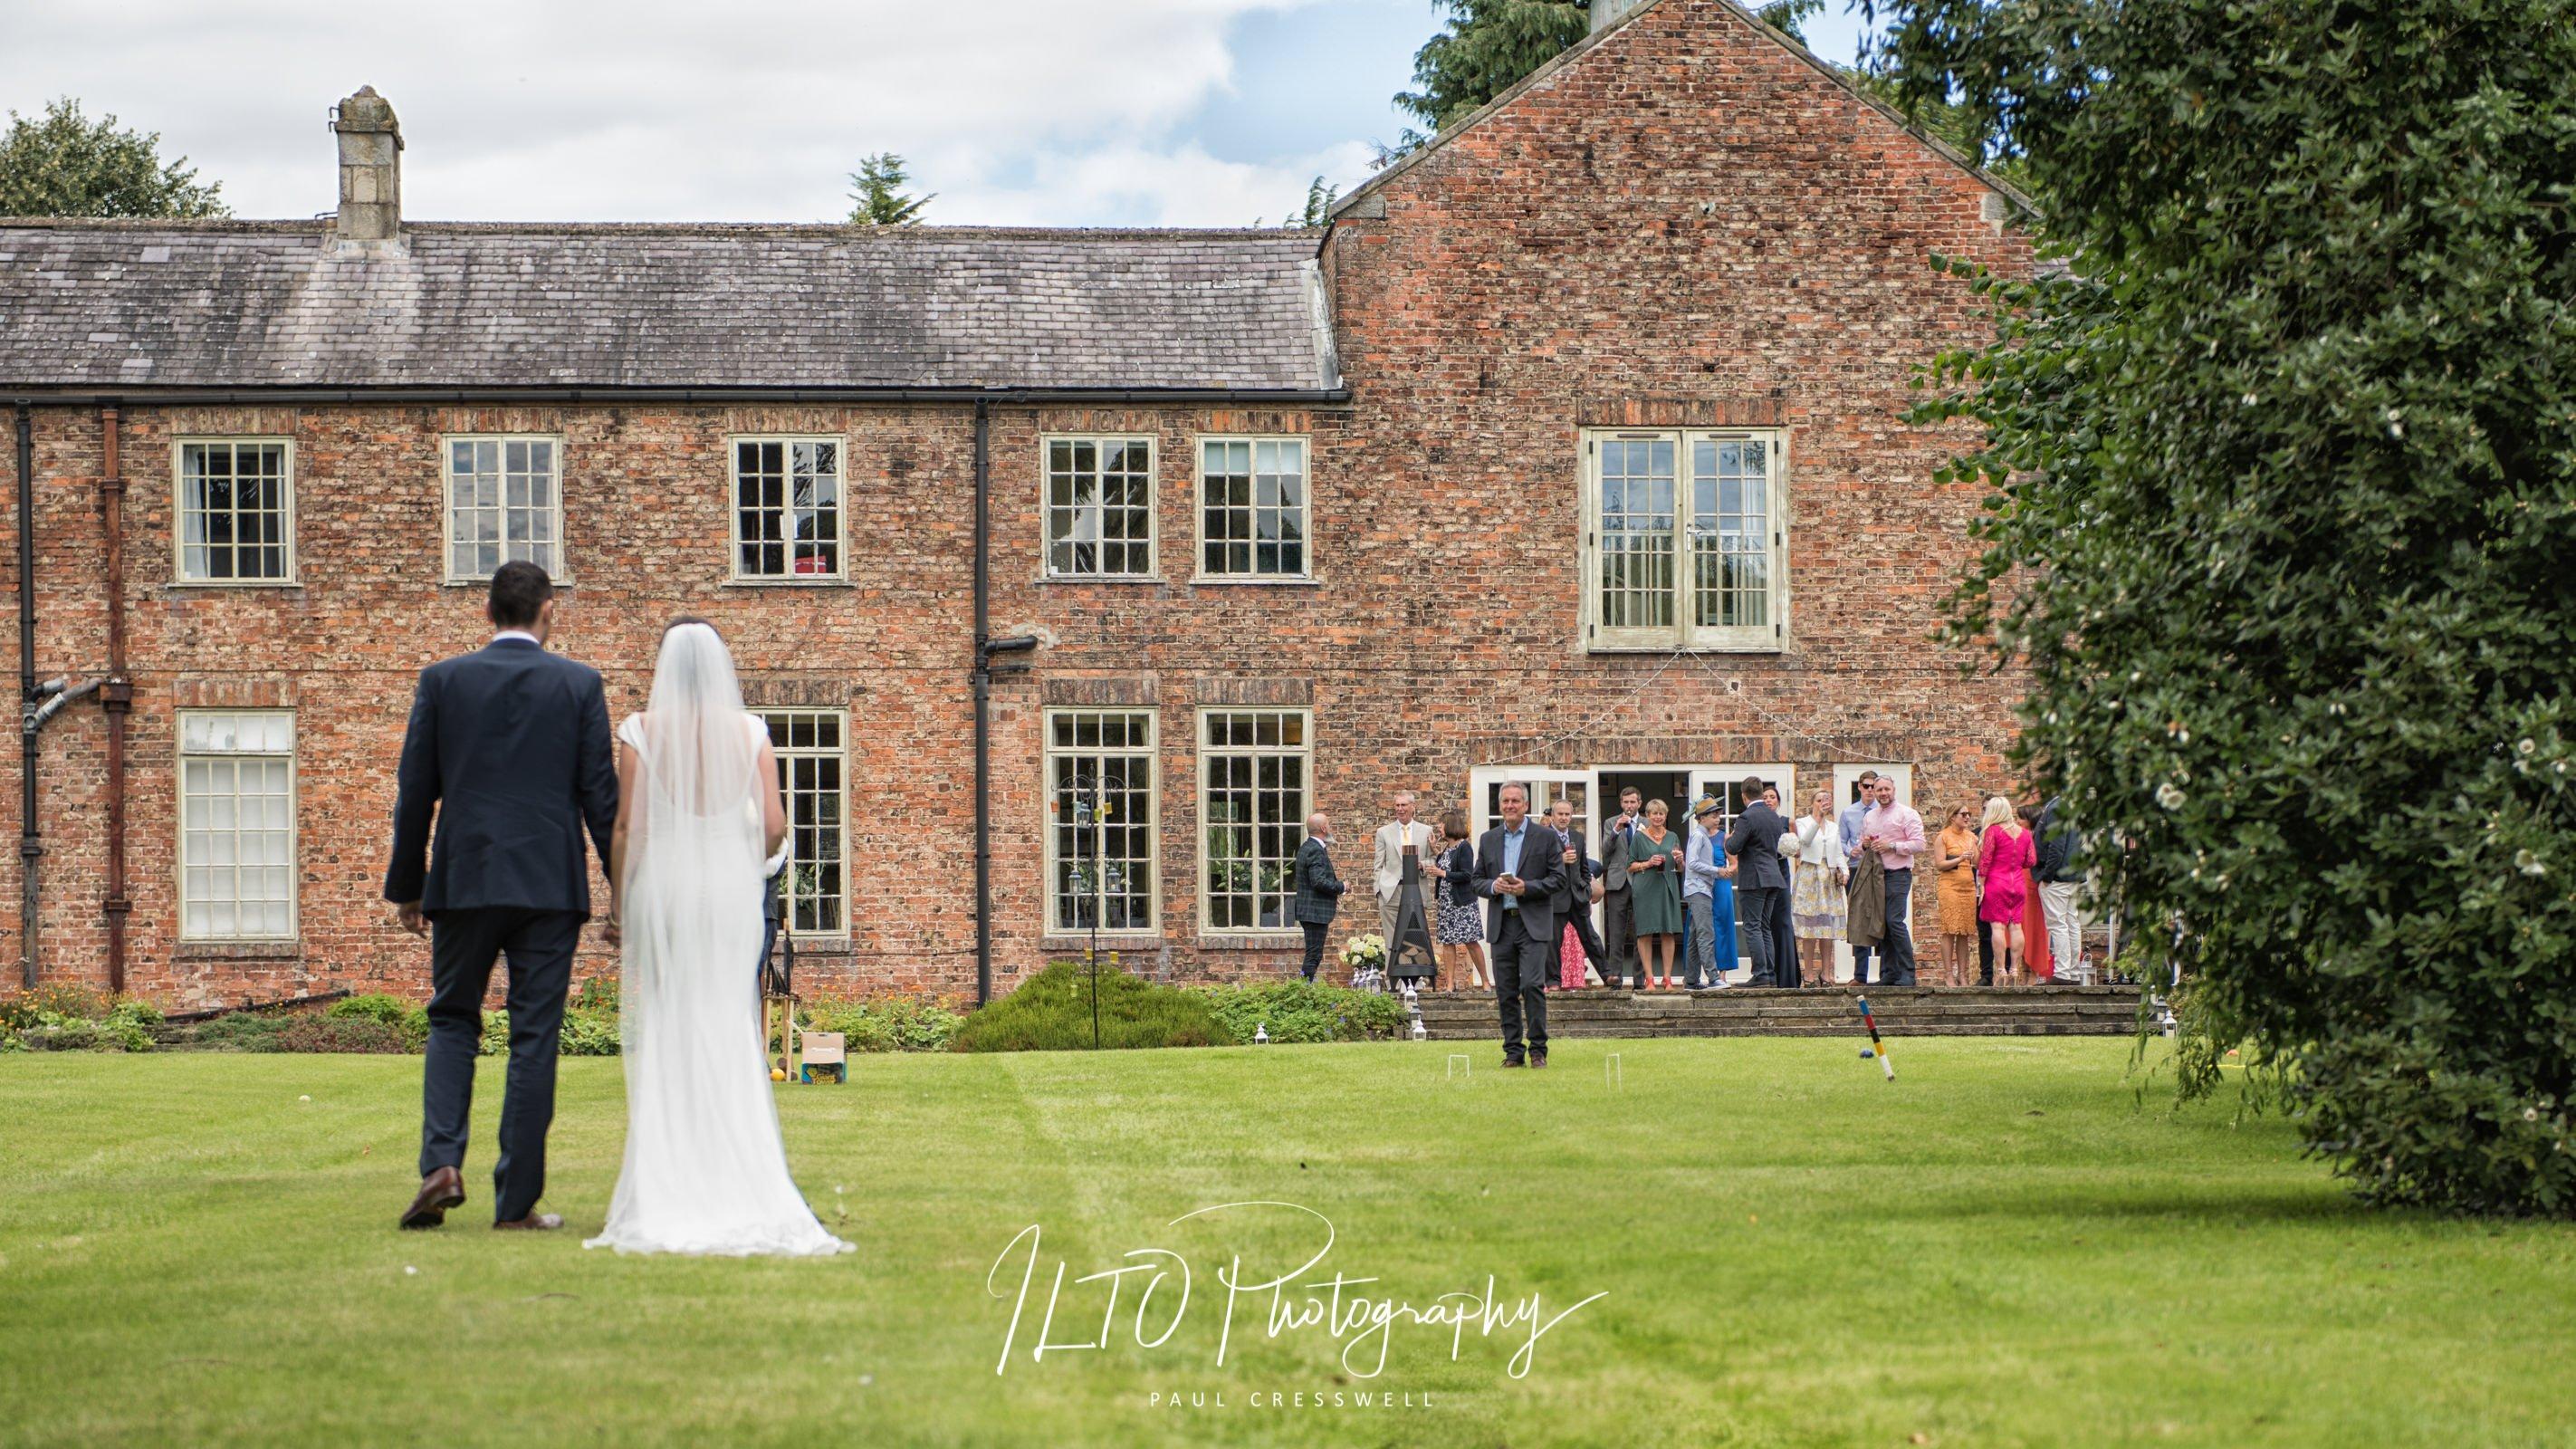 Wedding Portfolio, intimate wedding photography pictures